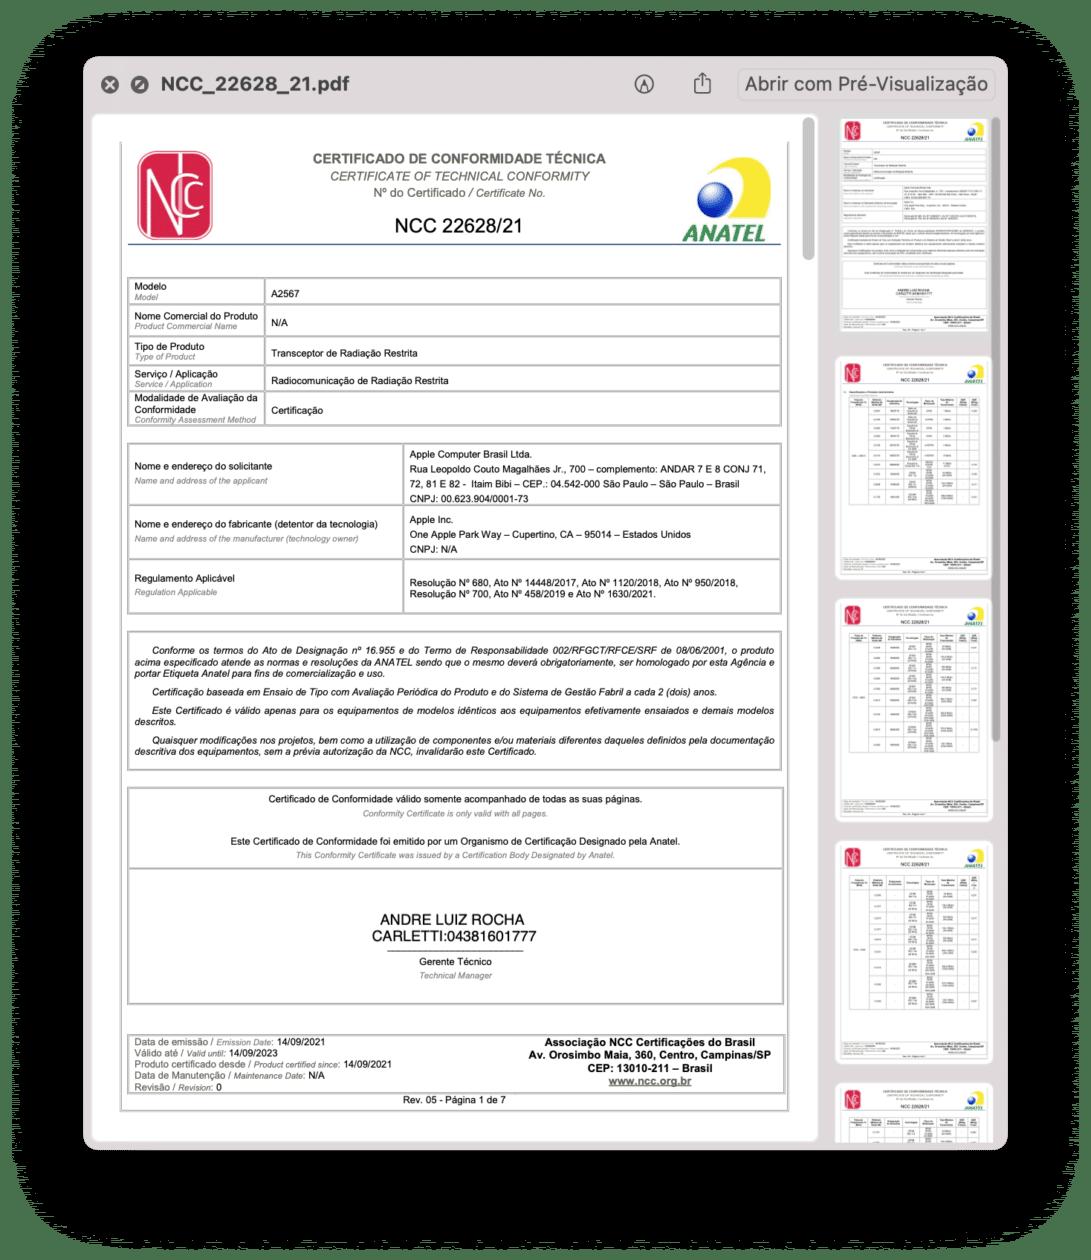 Certificado de Conformidade Técnica do iPad mini (Wi-Fi)